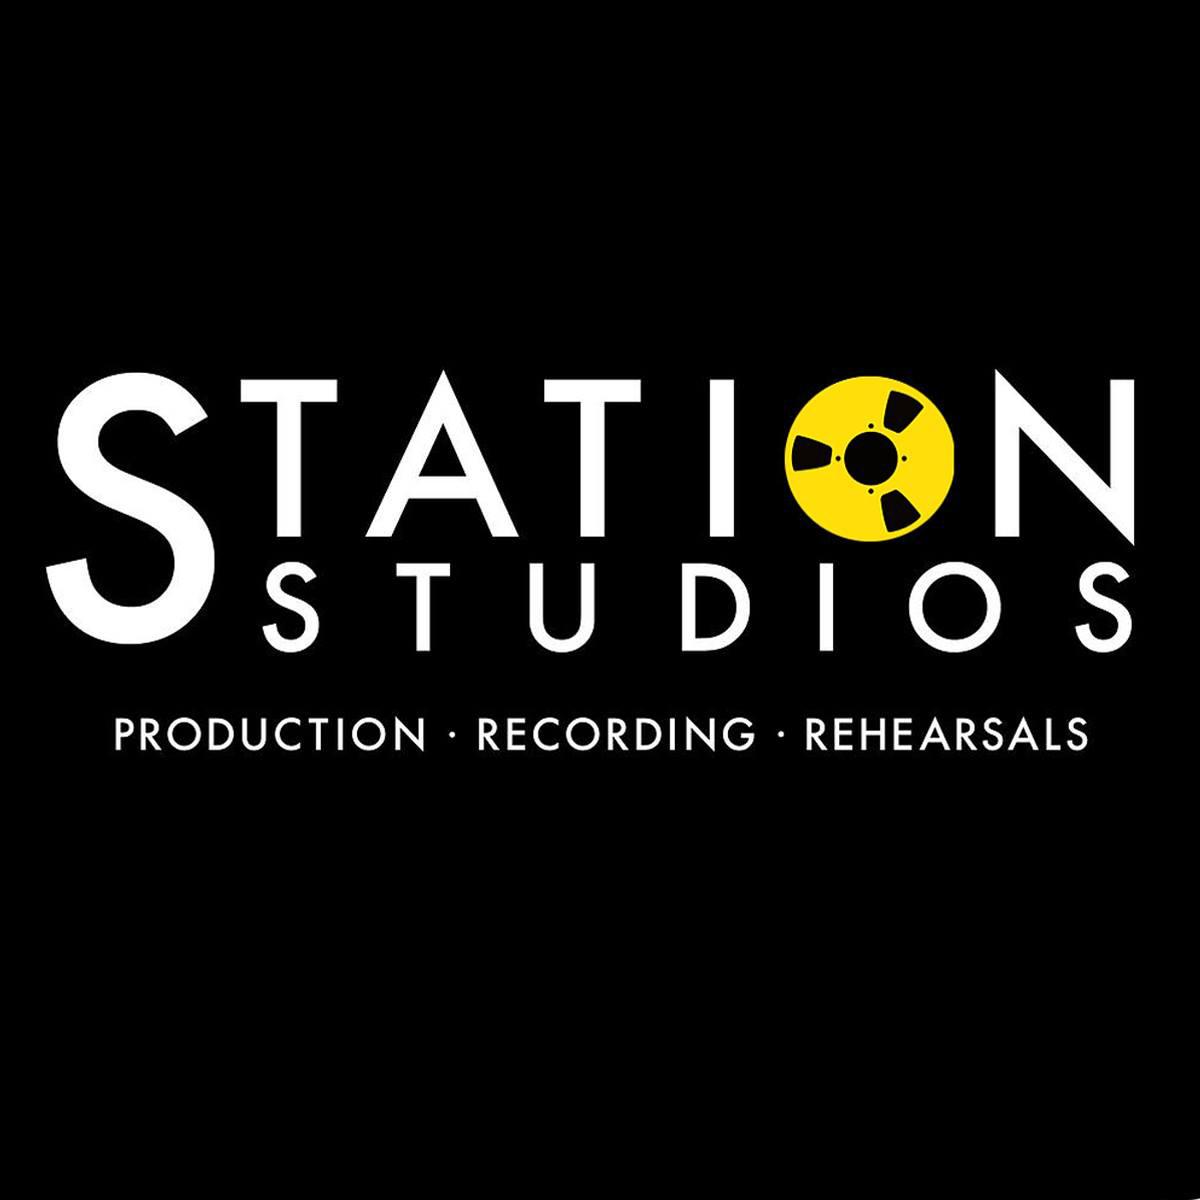 Station Studios